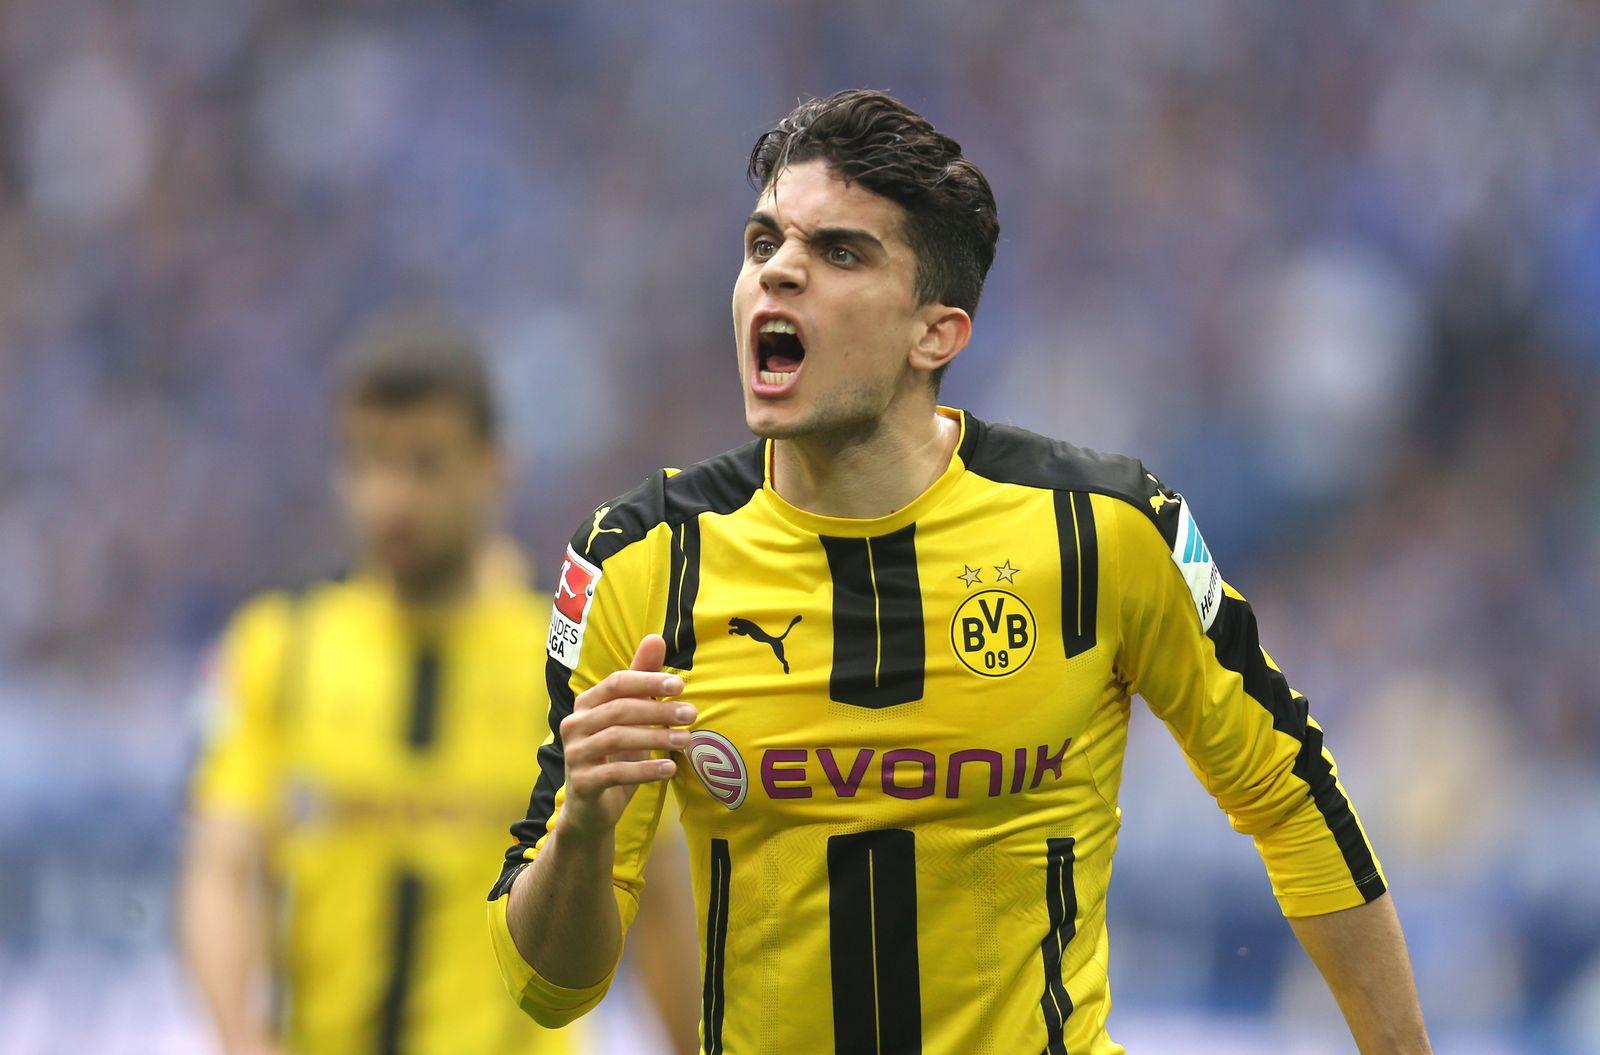 Borussia Dortmund - Marc Bartra